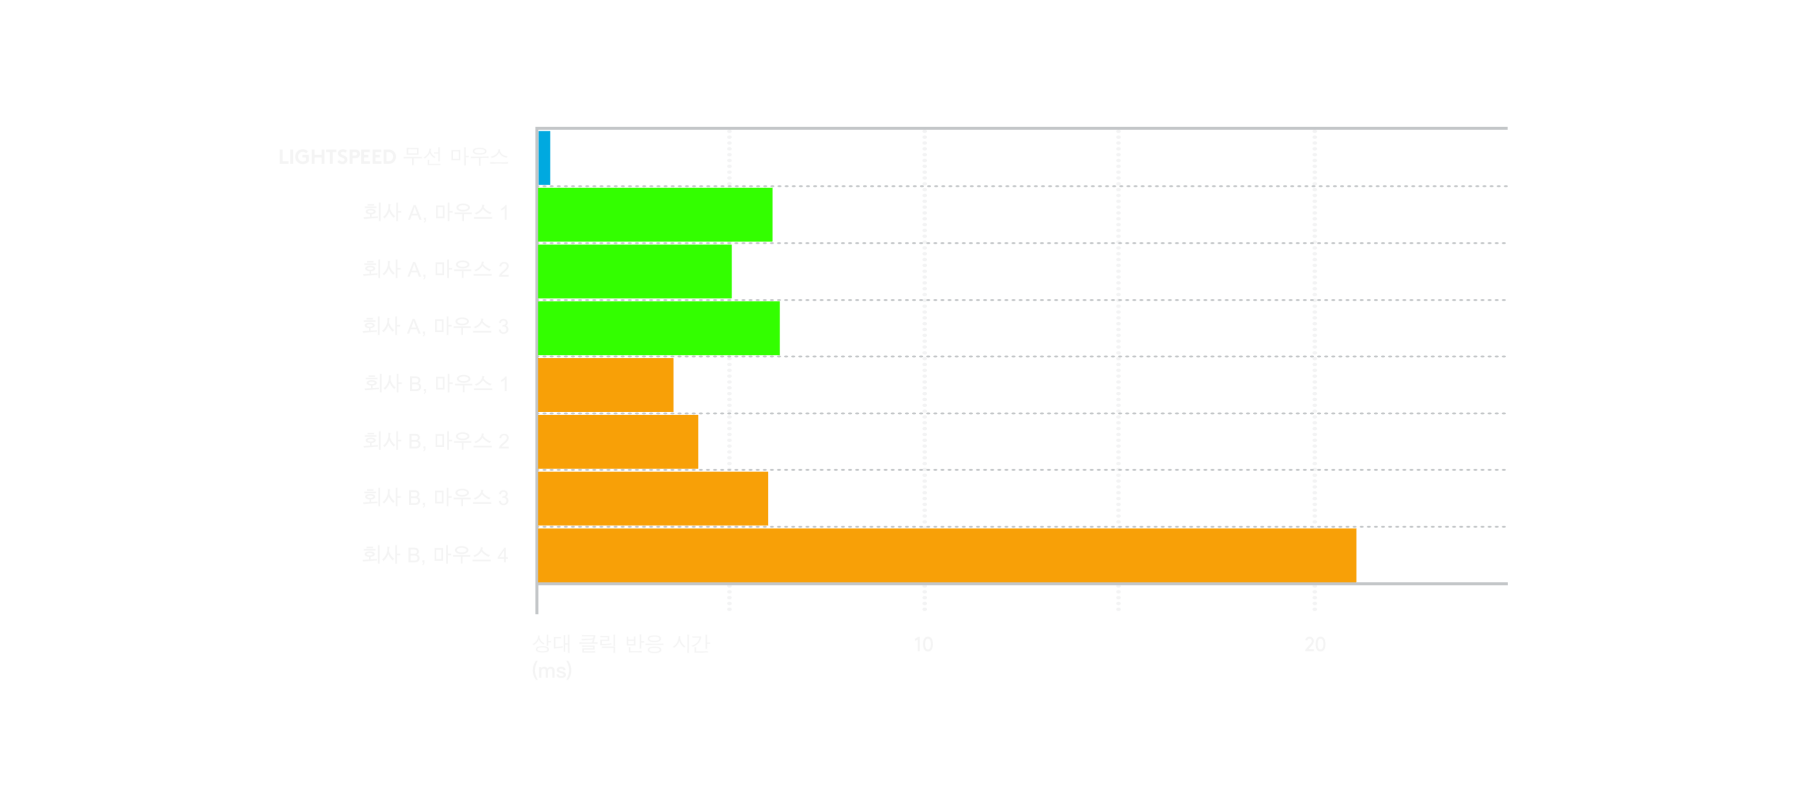 LIGHTSPEED 무선 기술이 경쟁 제품보다 빠르다는 것을 보여주는 차트